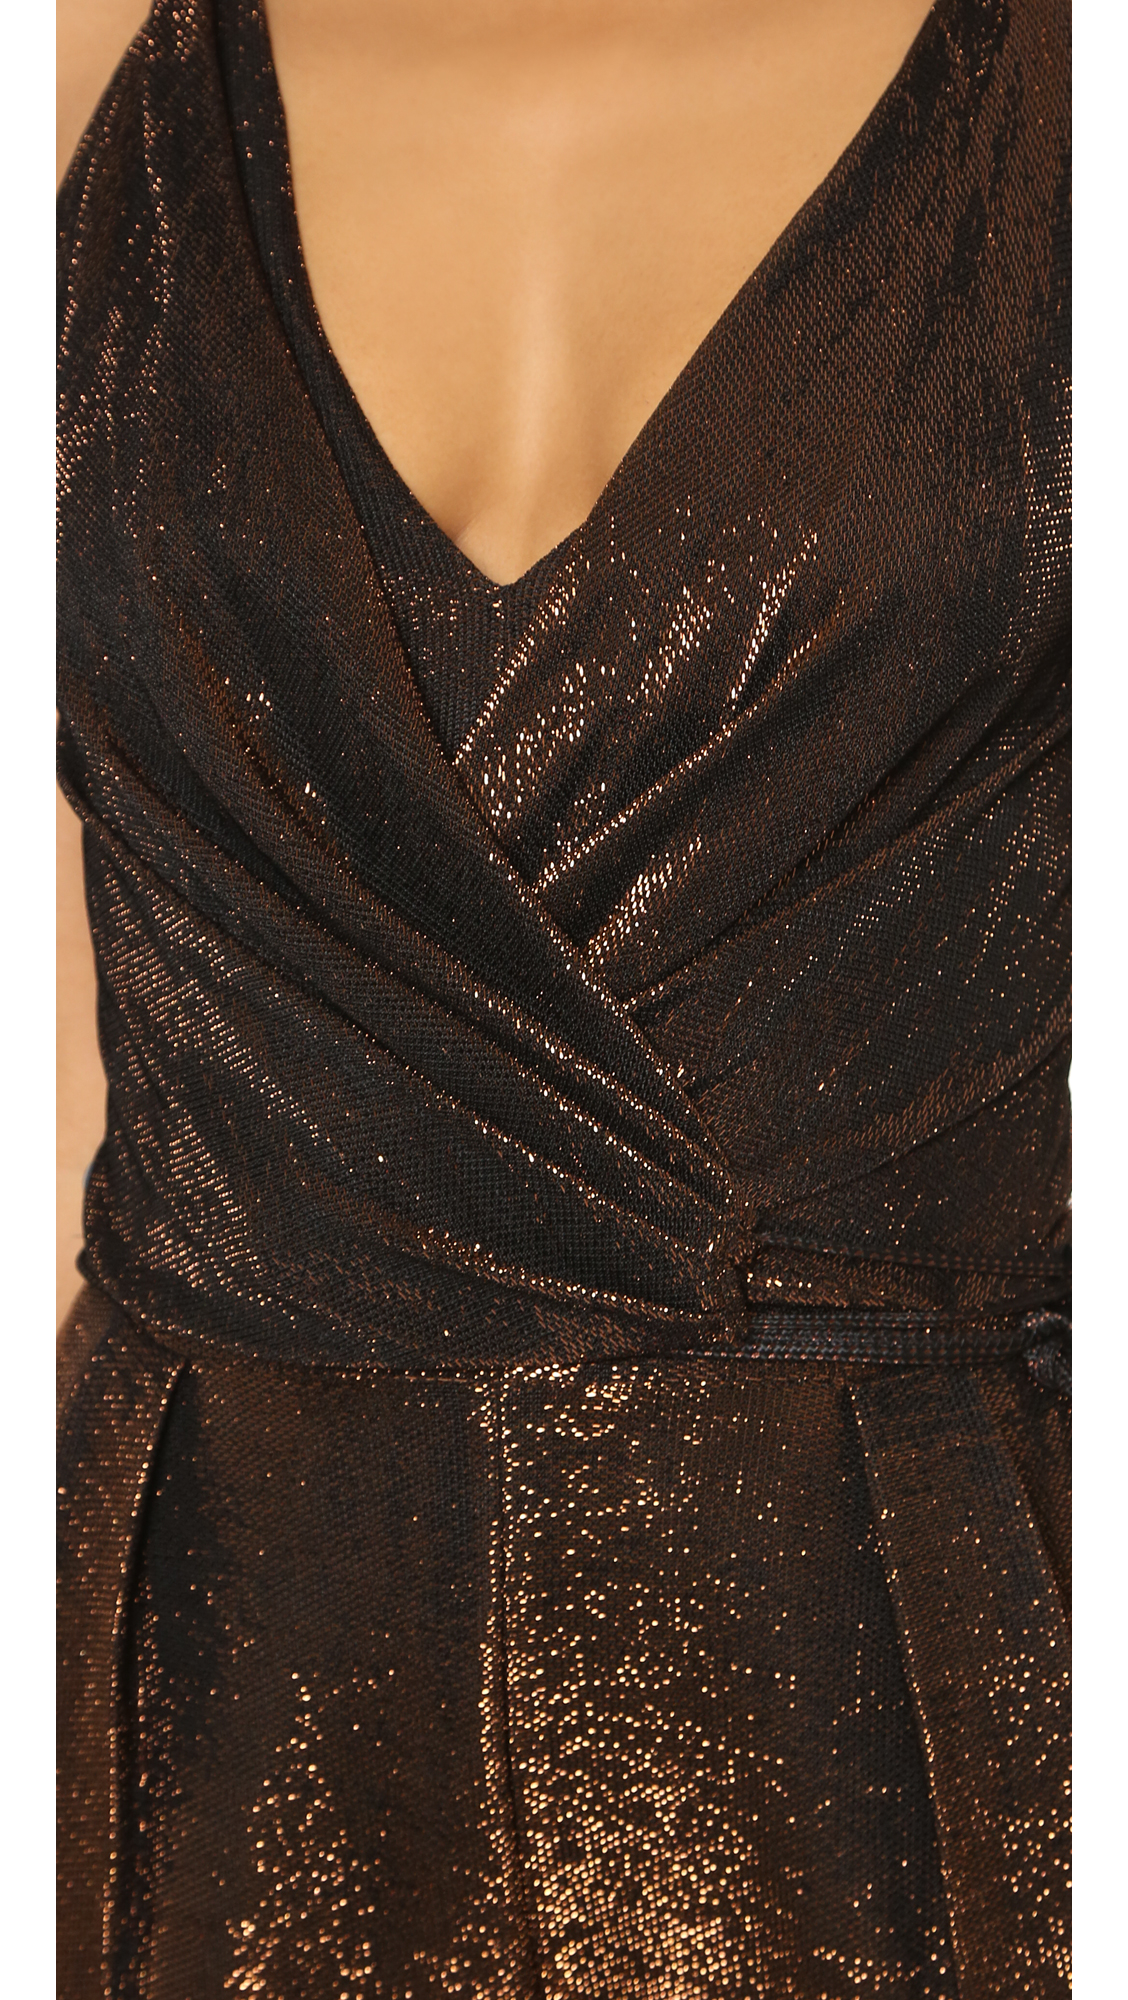 18d891a41d2 Lyst - Kempner Sienna Jumpsuit - Copper Metallic in Metallic